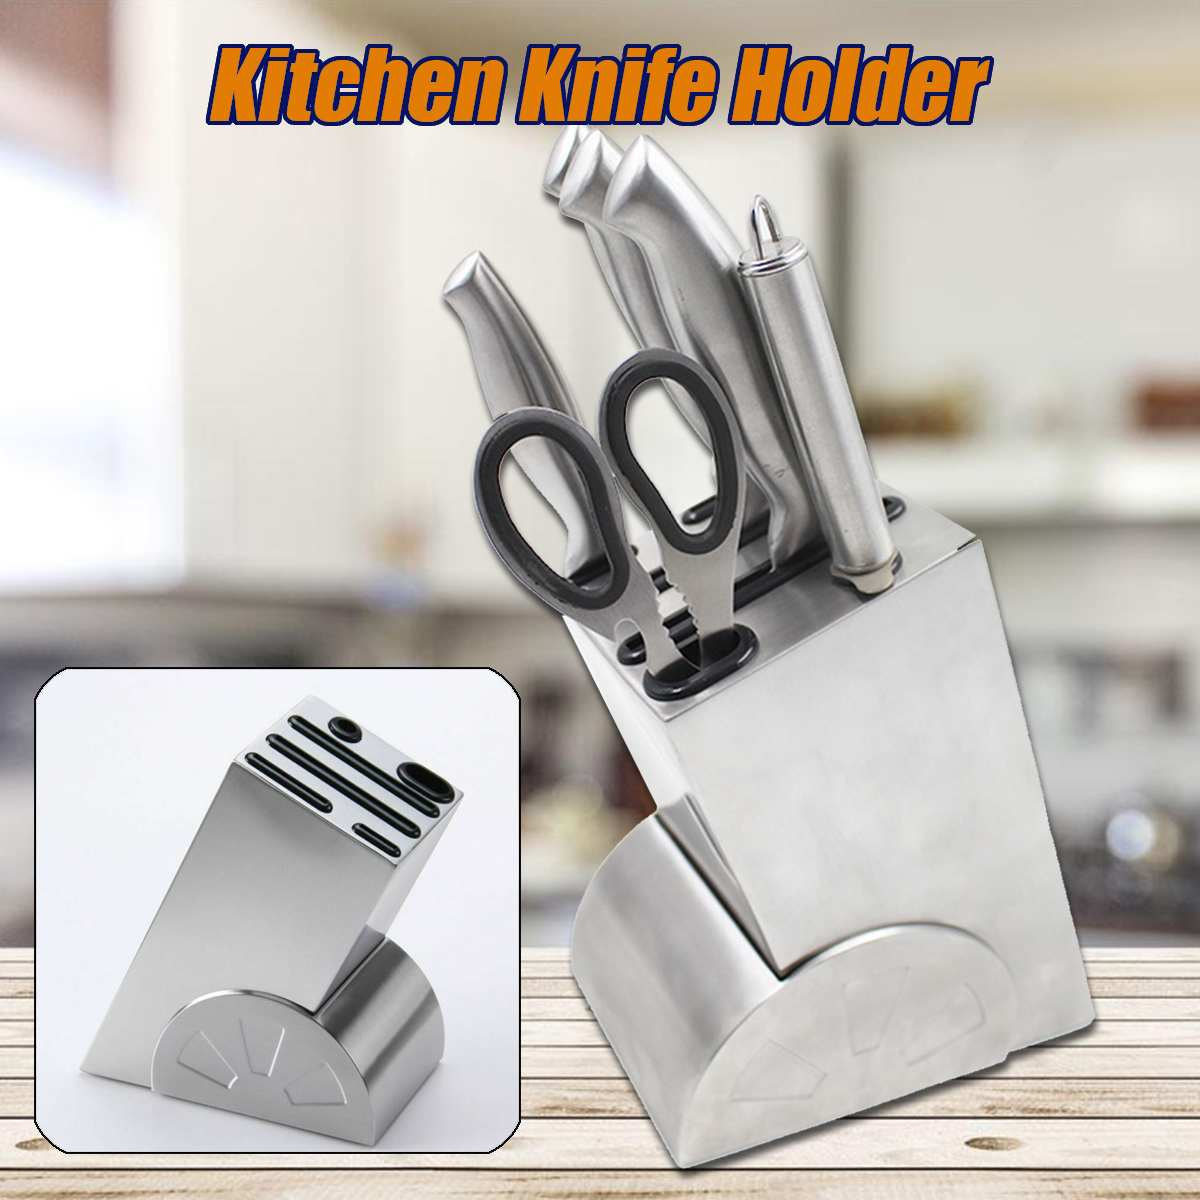 Kitchen Knife Block Knives Holder Organizer Metal Rack Storage Block Stainless Steel Knife Rest Shelf Tools Packing Accessories